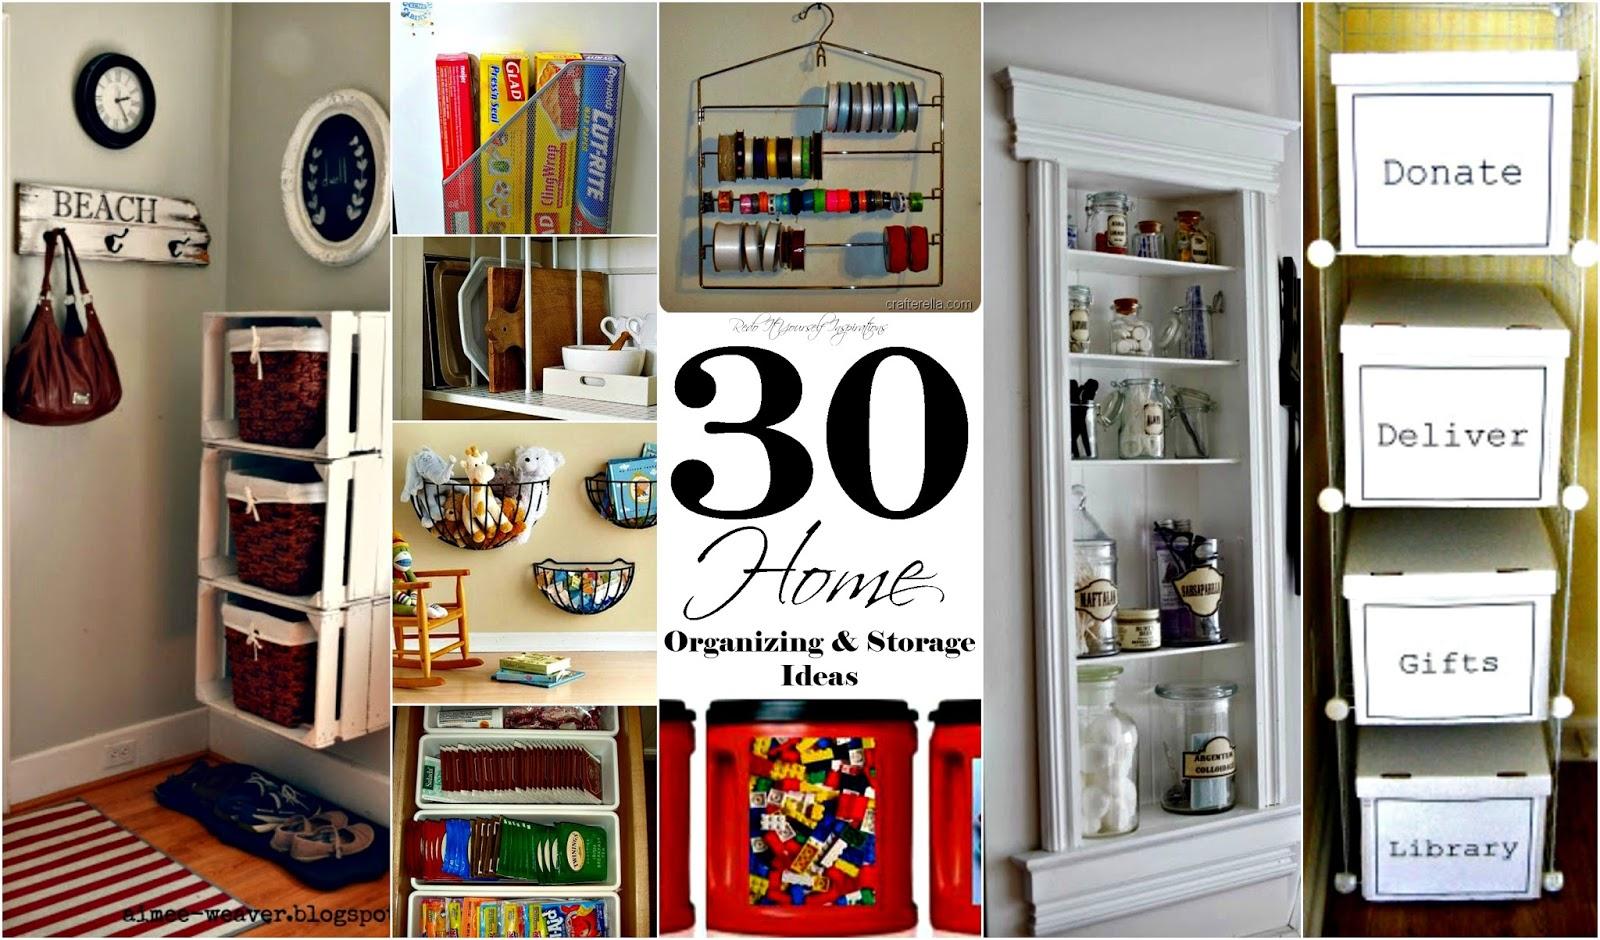 Home organizing and storage ideas redo it yourself House organization ideas